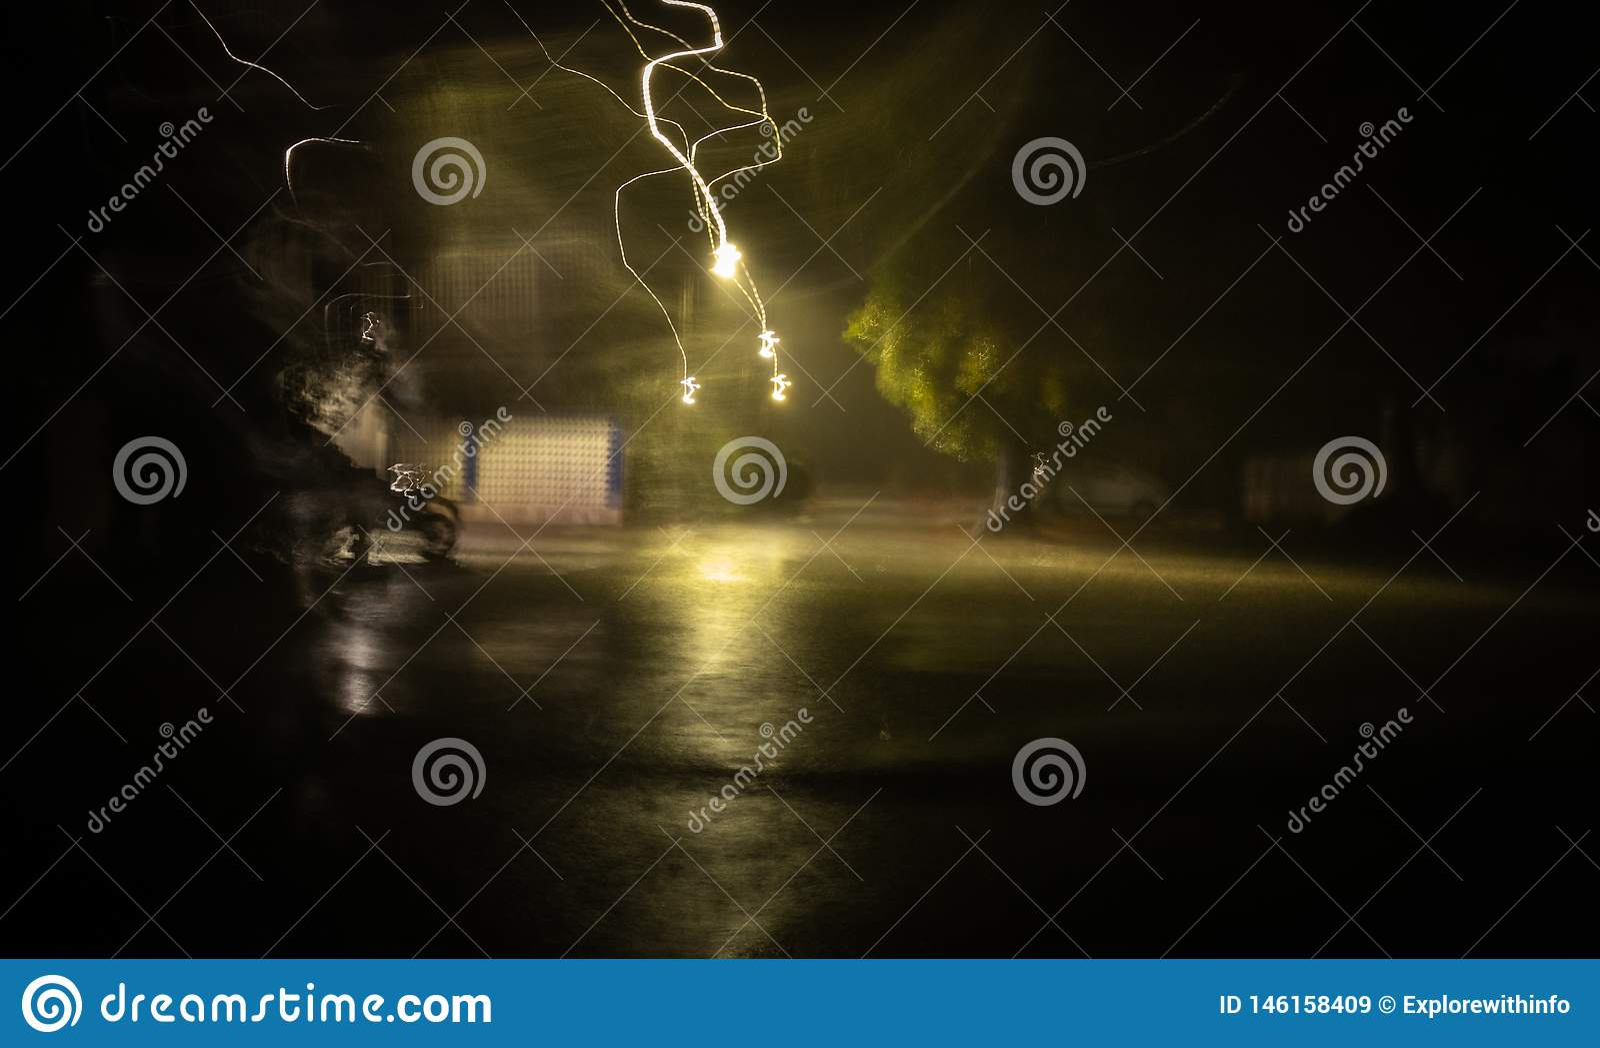 Brilho atual elétrico durante a chuva e trovão